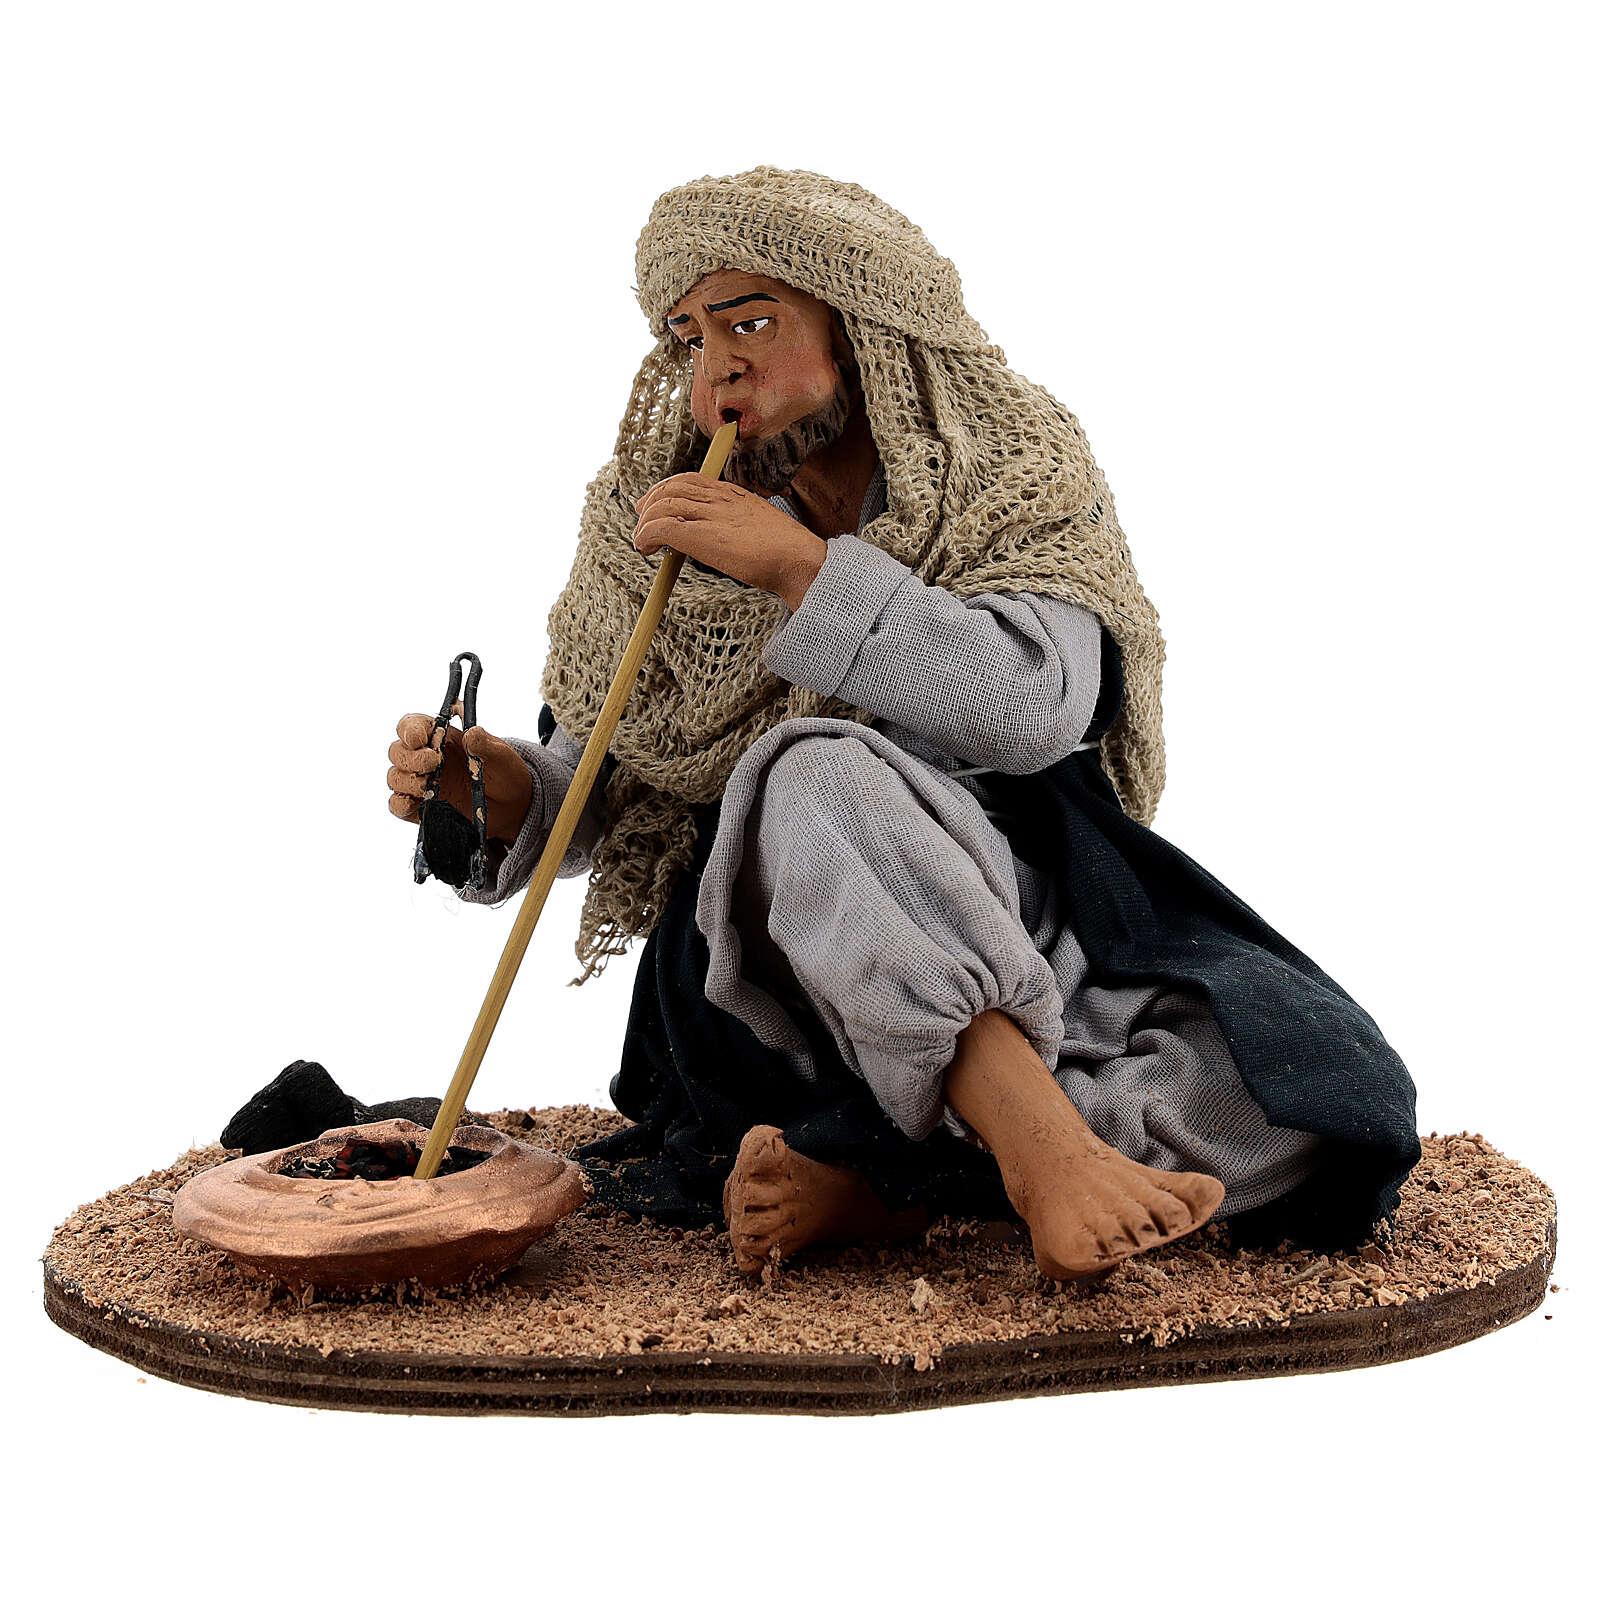 Man blowing a fire figurine 30 cm Neapolitan nativity 4